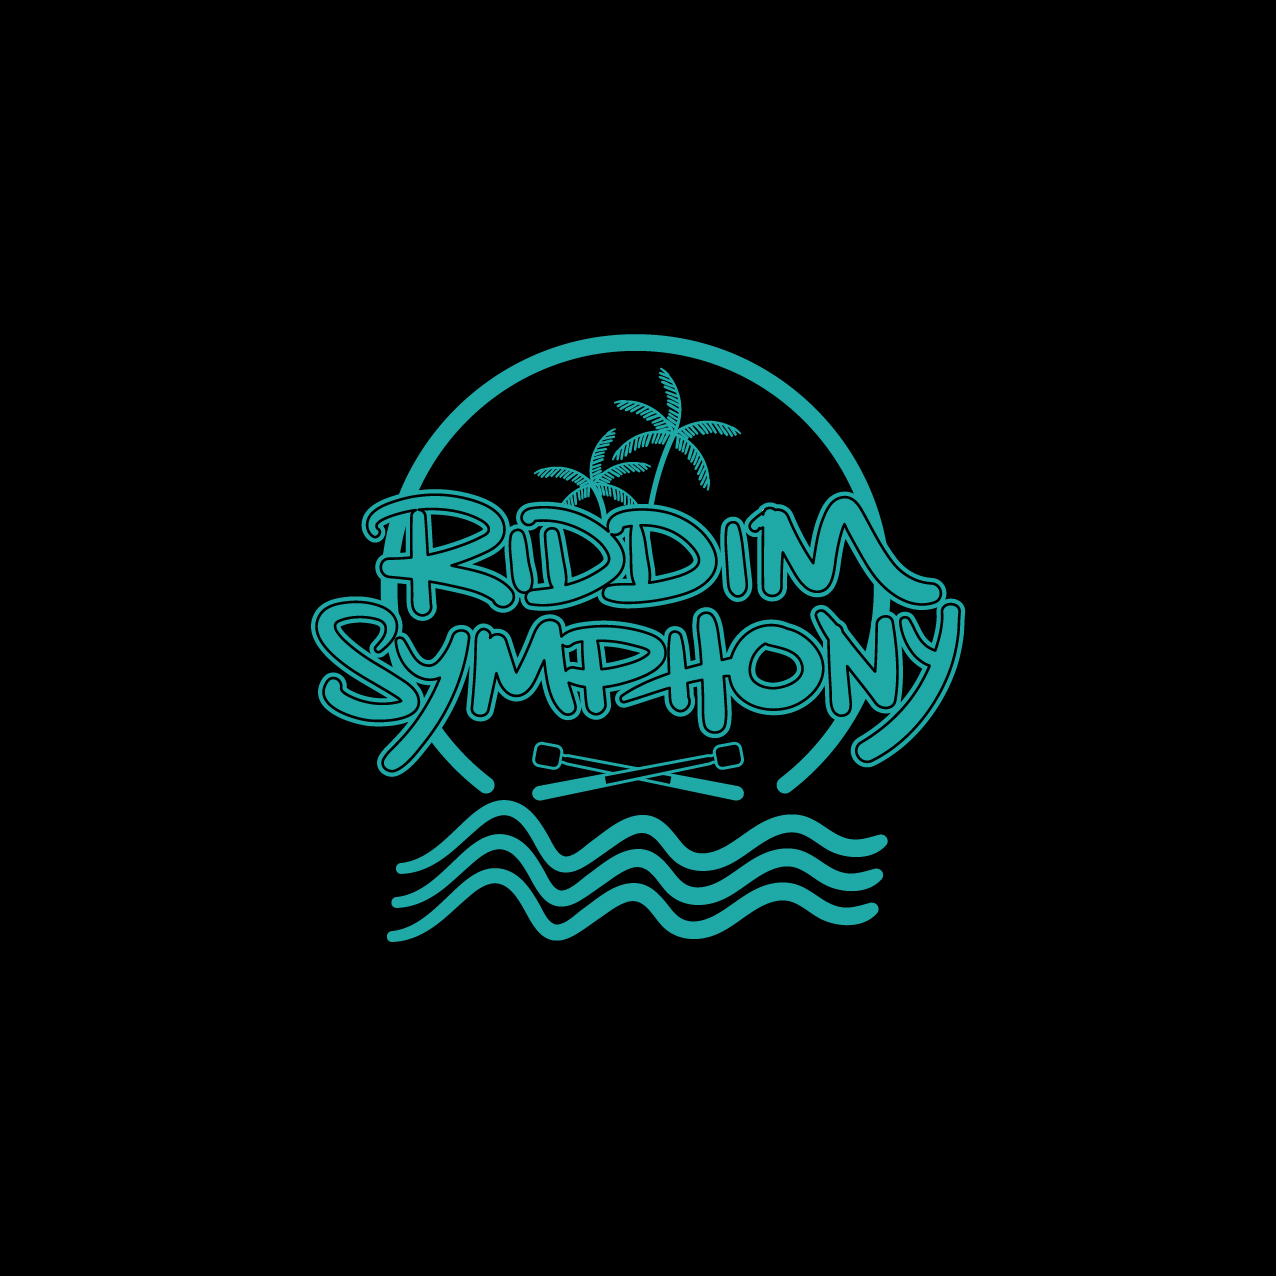 Riddim-Symphony-Logo-ideas-squarespace-c-01.jpg